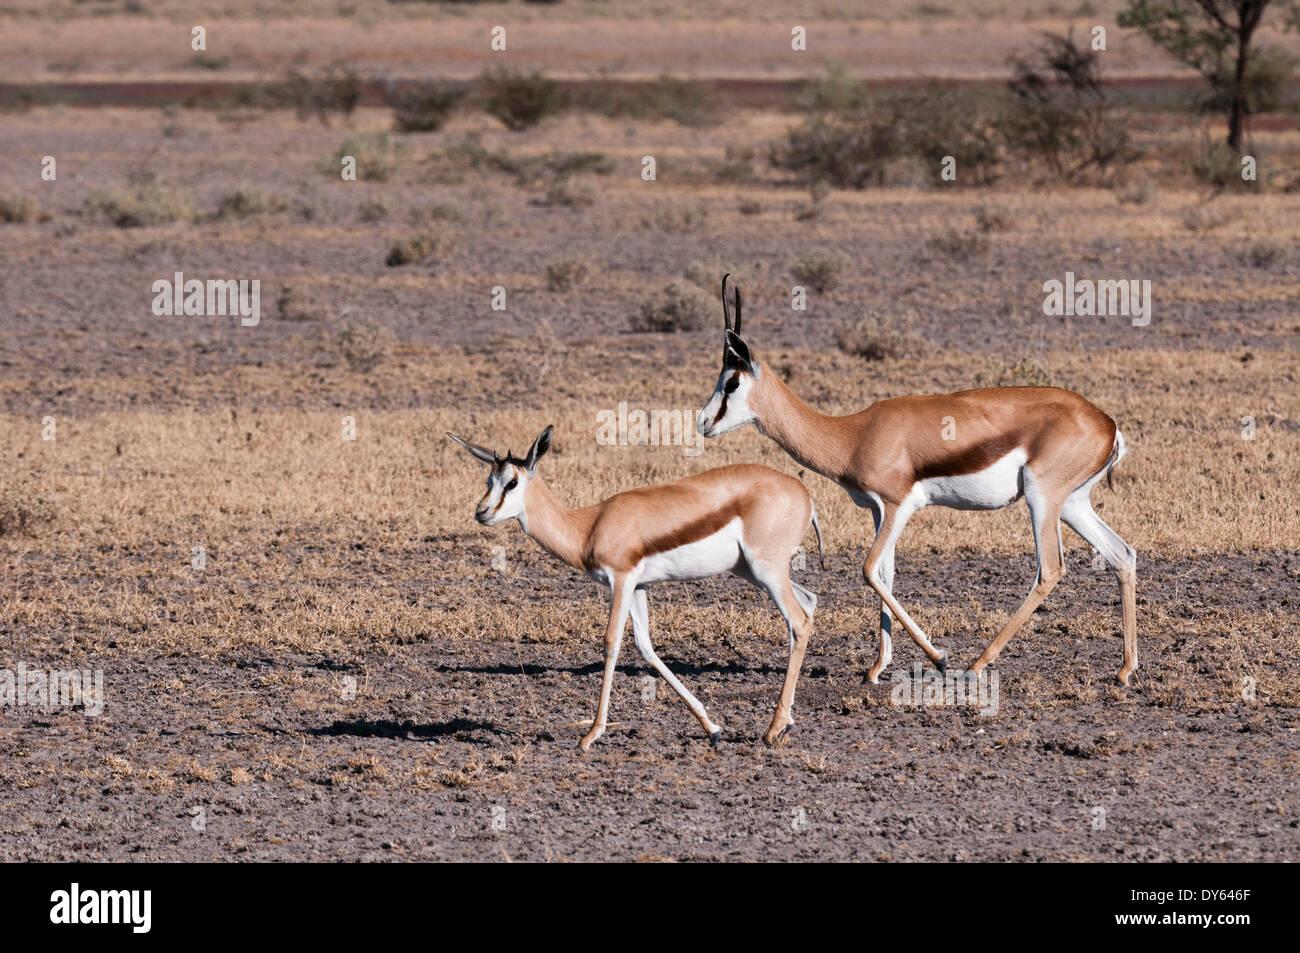 Springbok (Antidorcas marsupialis), Central Kalahari National Park, Botswana, Africa - Stock Image